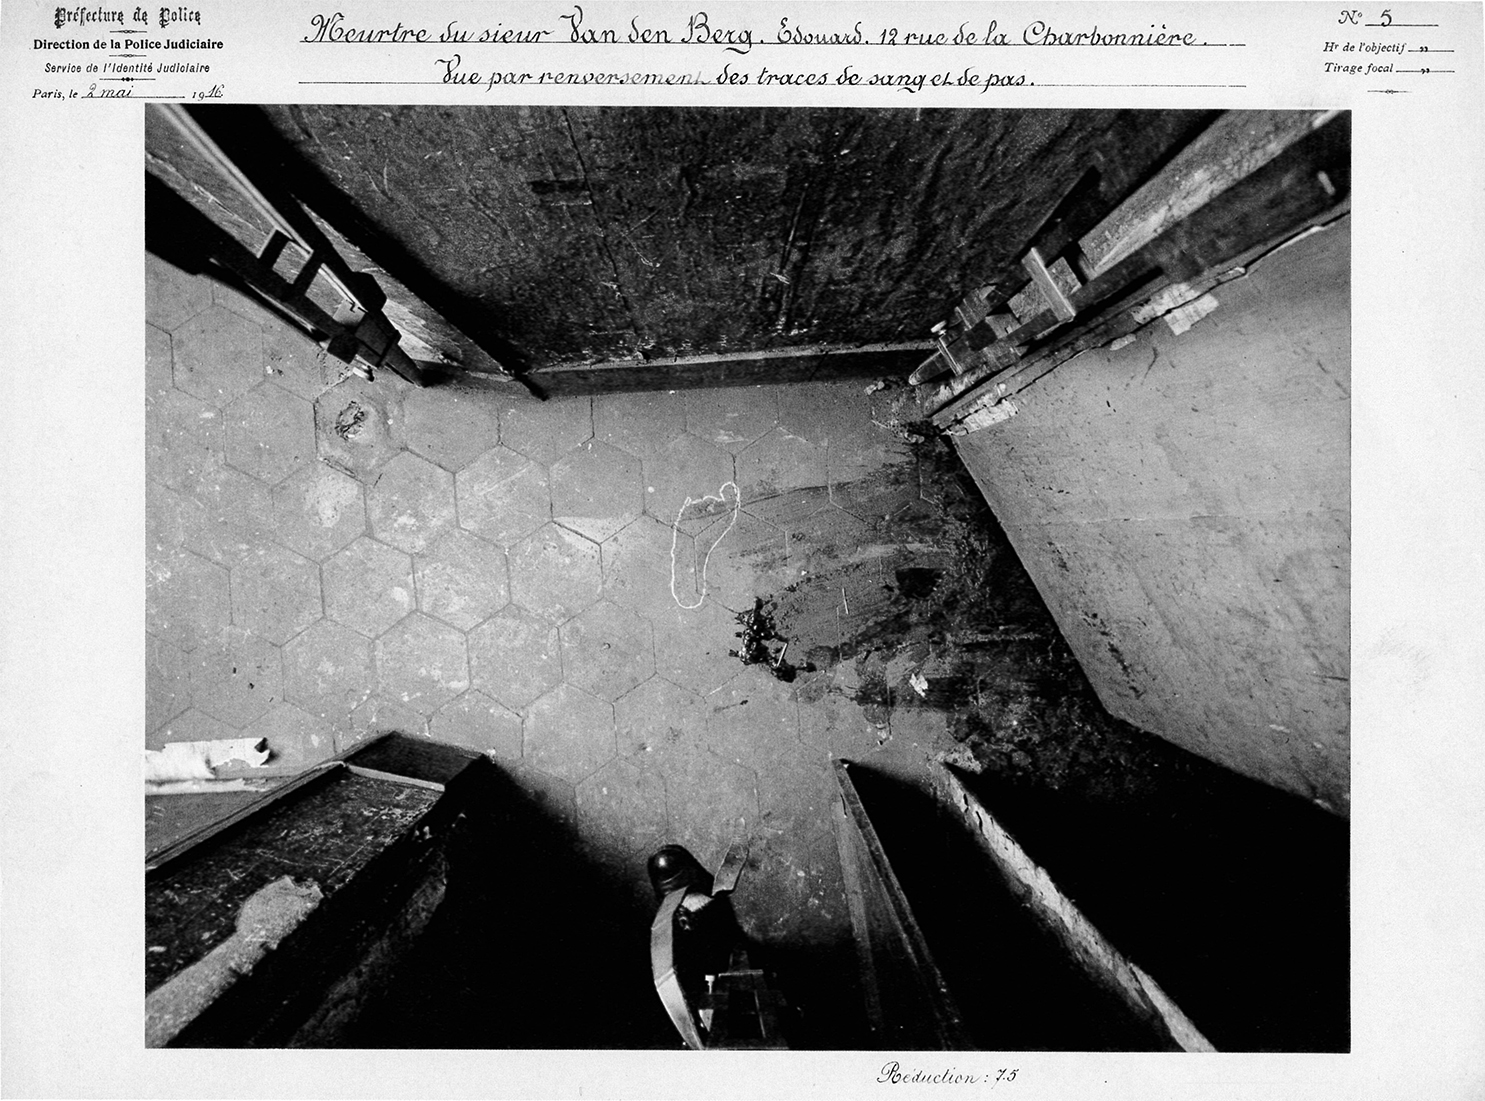 Crime Scene Photograph by Alphonse Bertillon, 9 May 1916